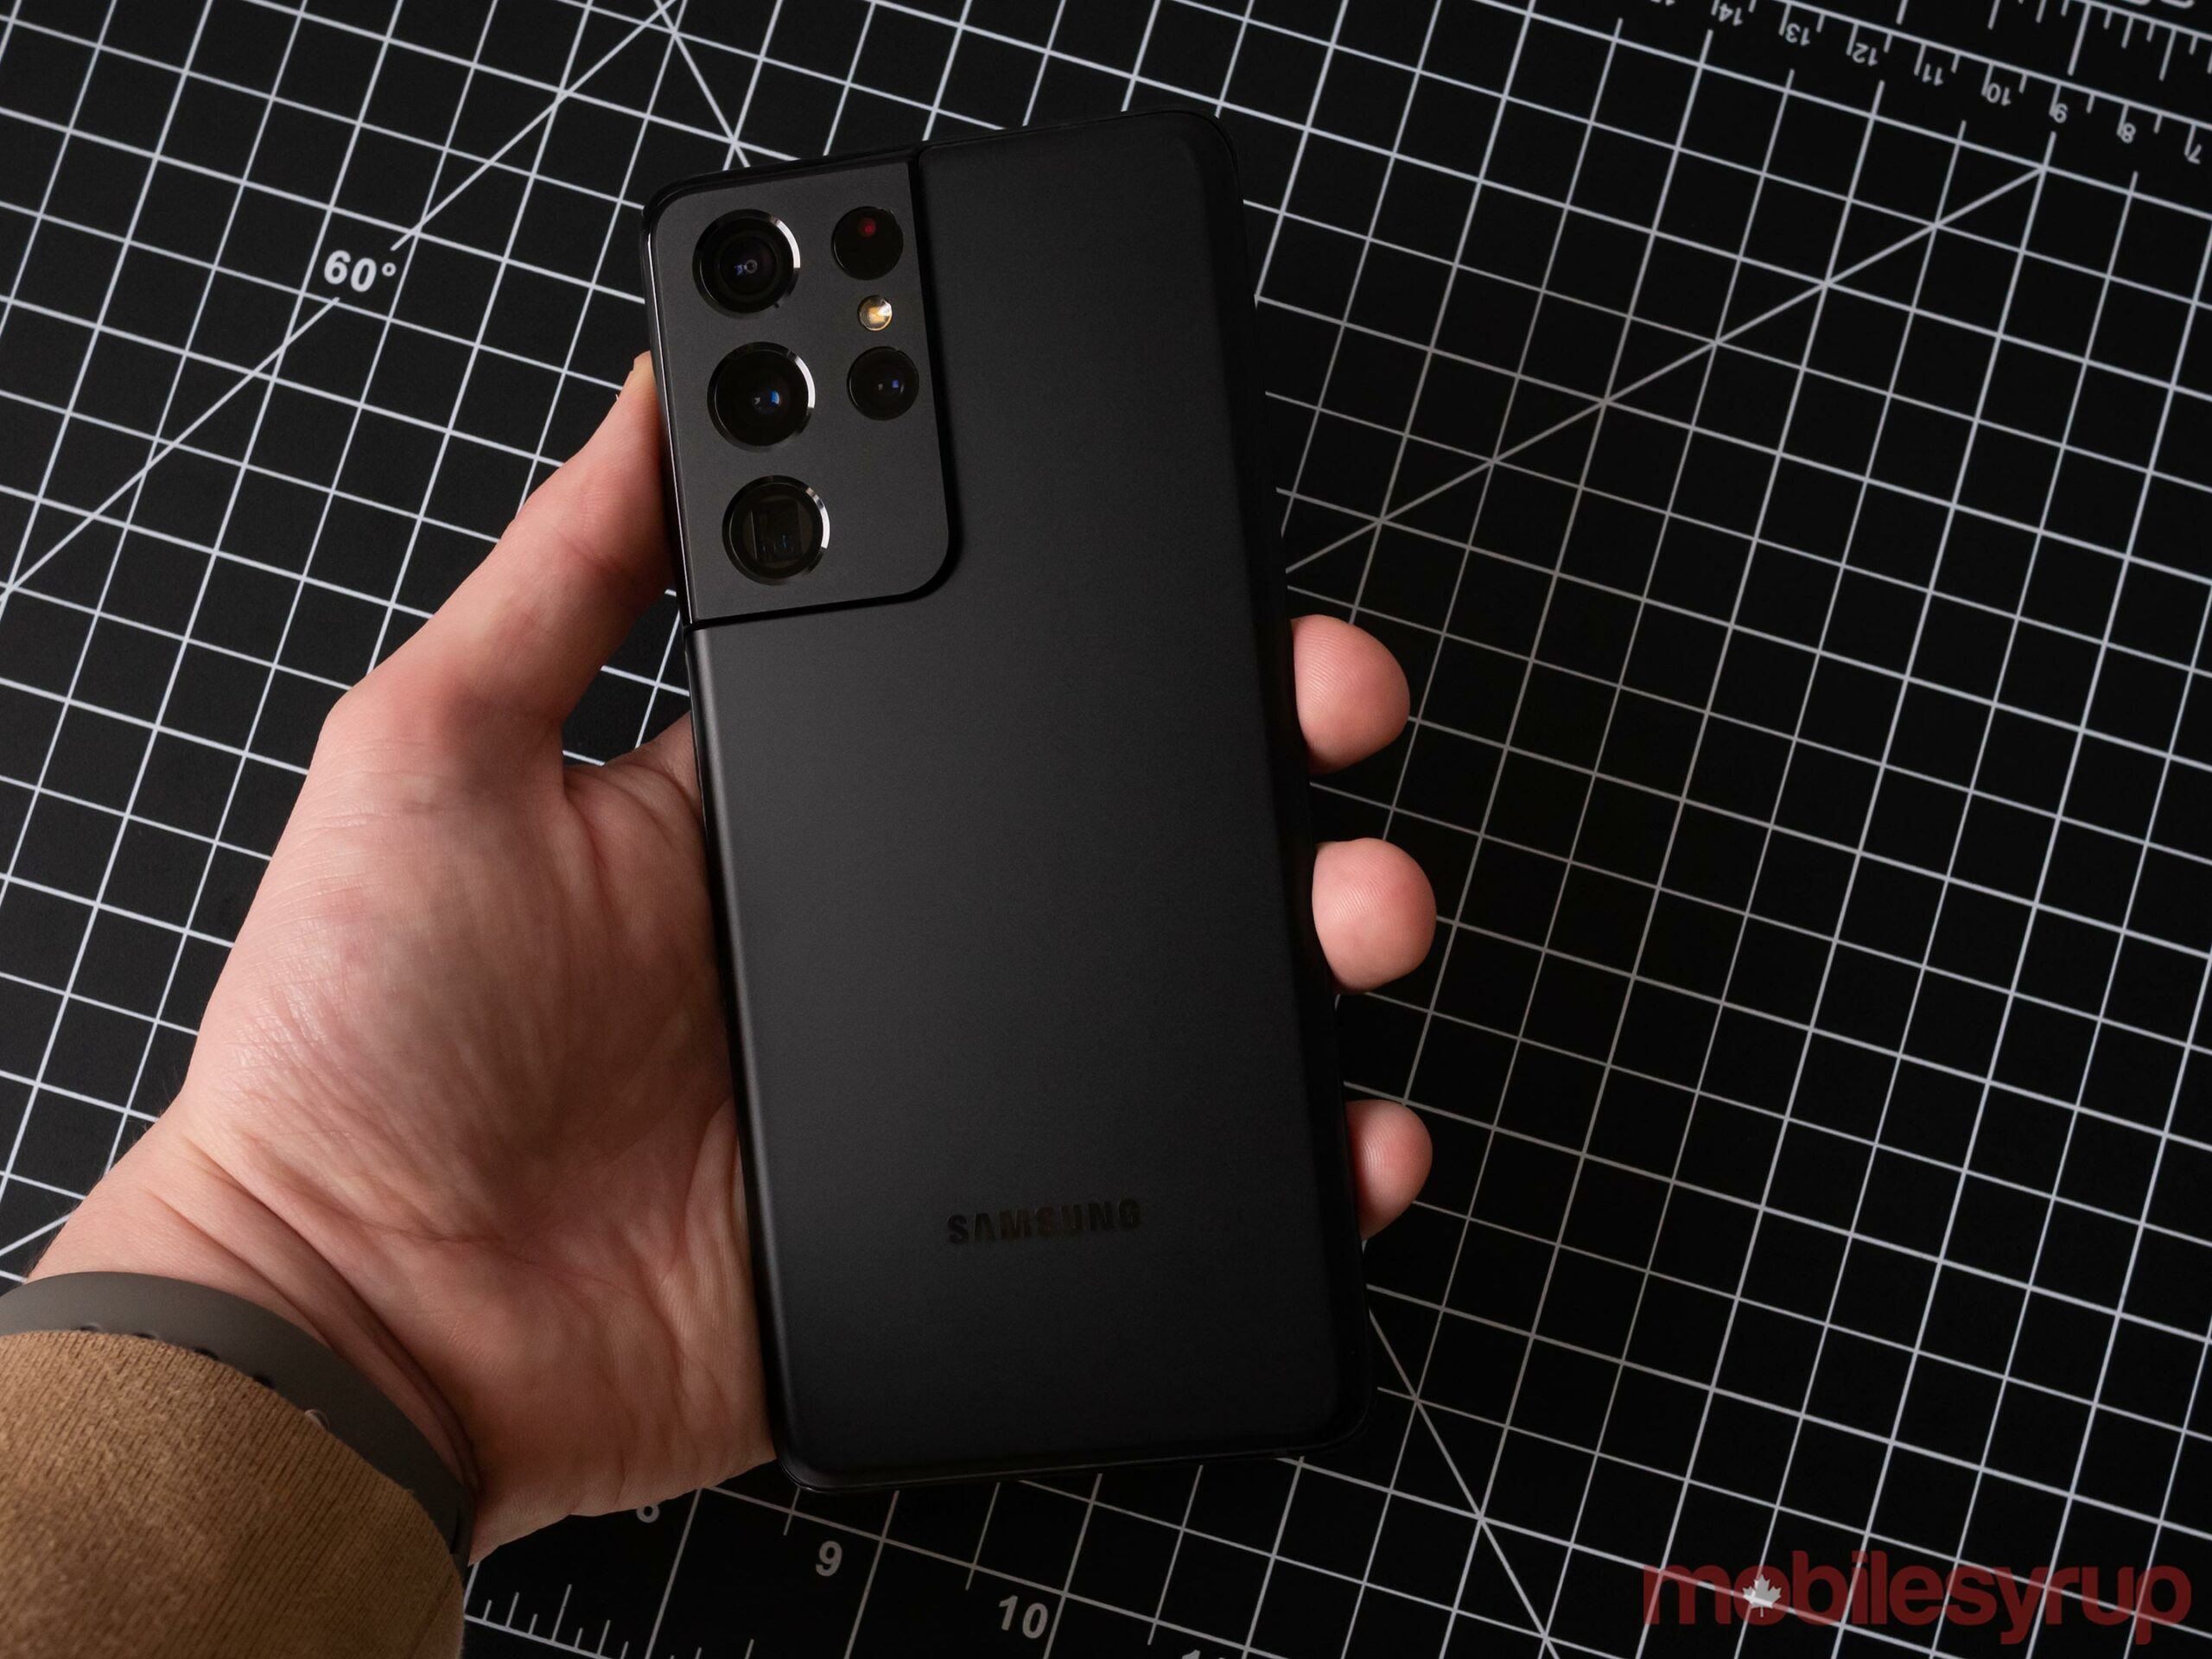 Galaxy S20 Ultra in hand